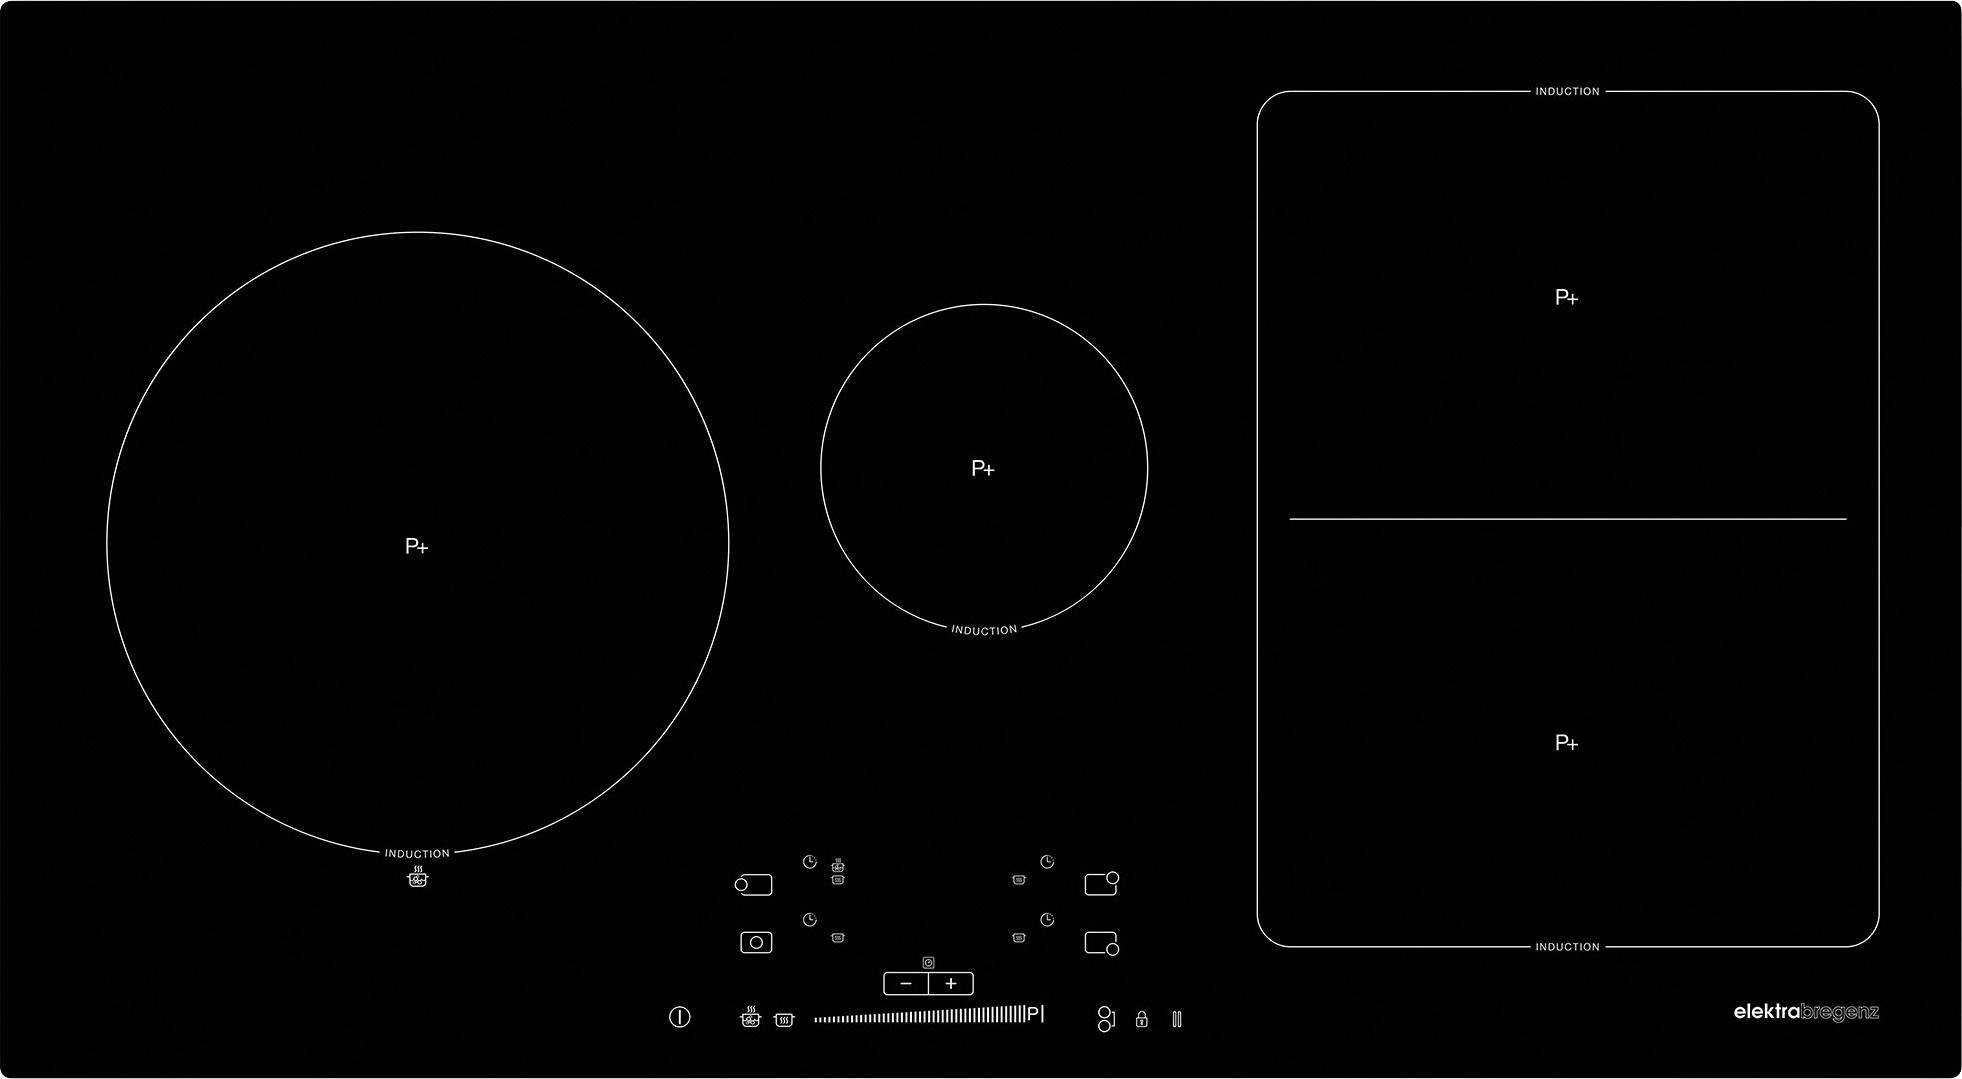 kochfeld ceran 90cm mega komfort siemens ex lvv e cm induktions kochfeld kochfeld autark cm. Black Bedroom Furniture Sets. Home Design Ideas